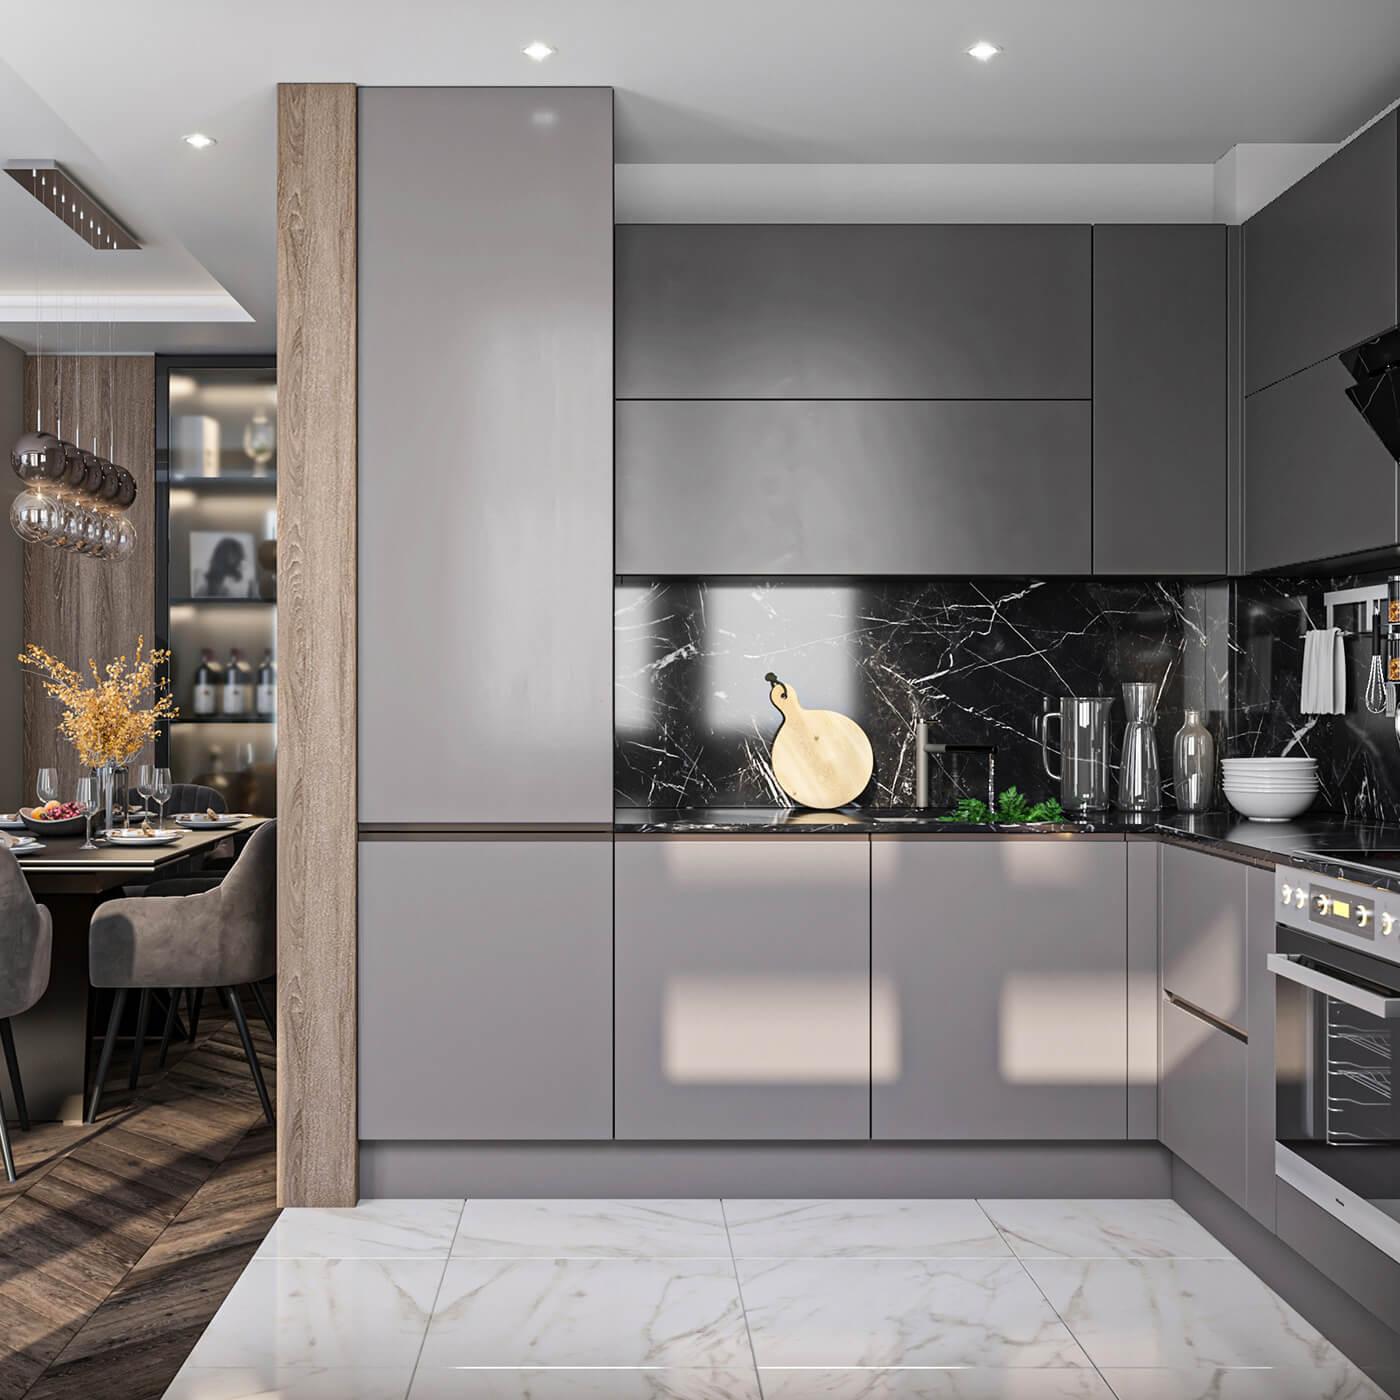 interioren-dizain-proekt-na-kuhnia-marquise-2